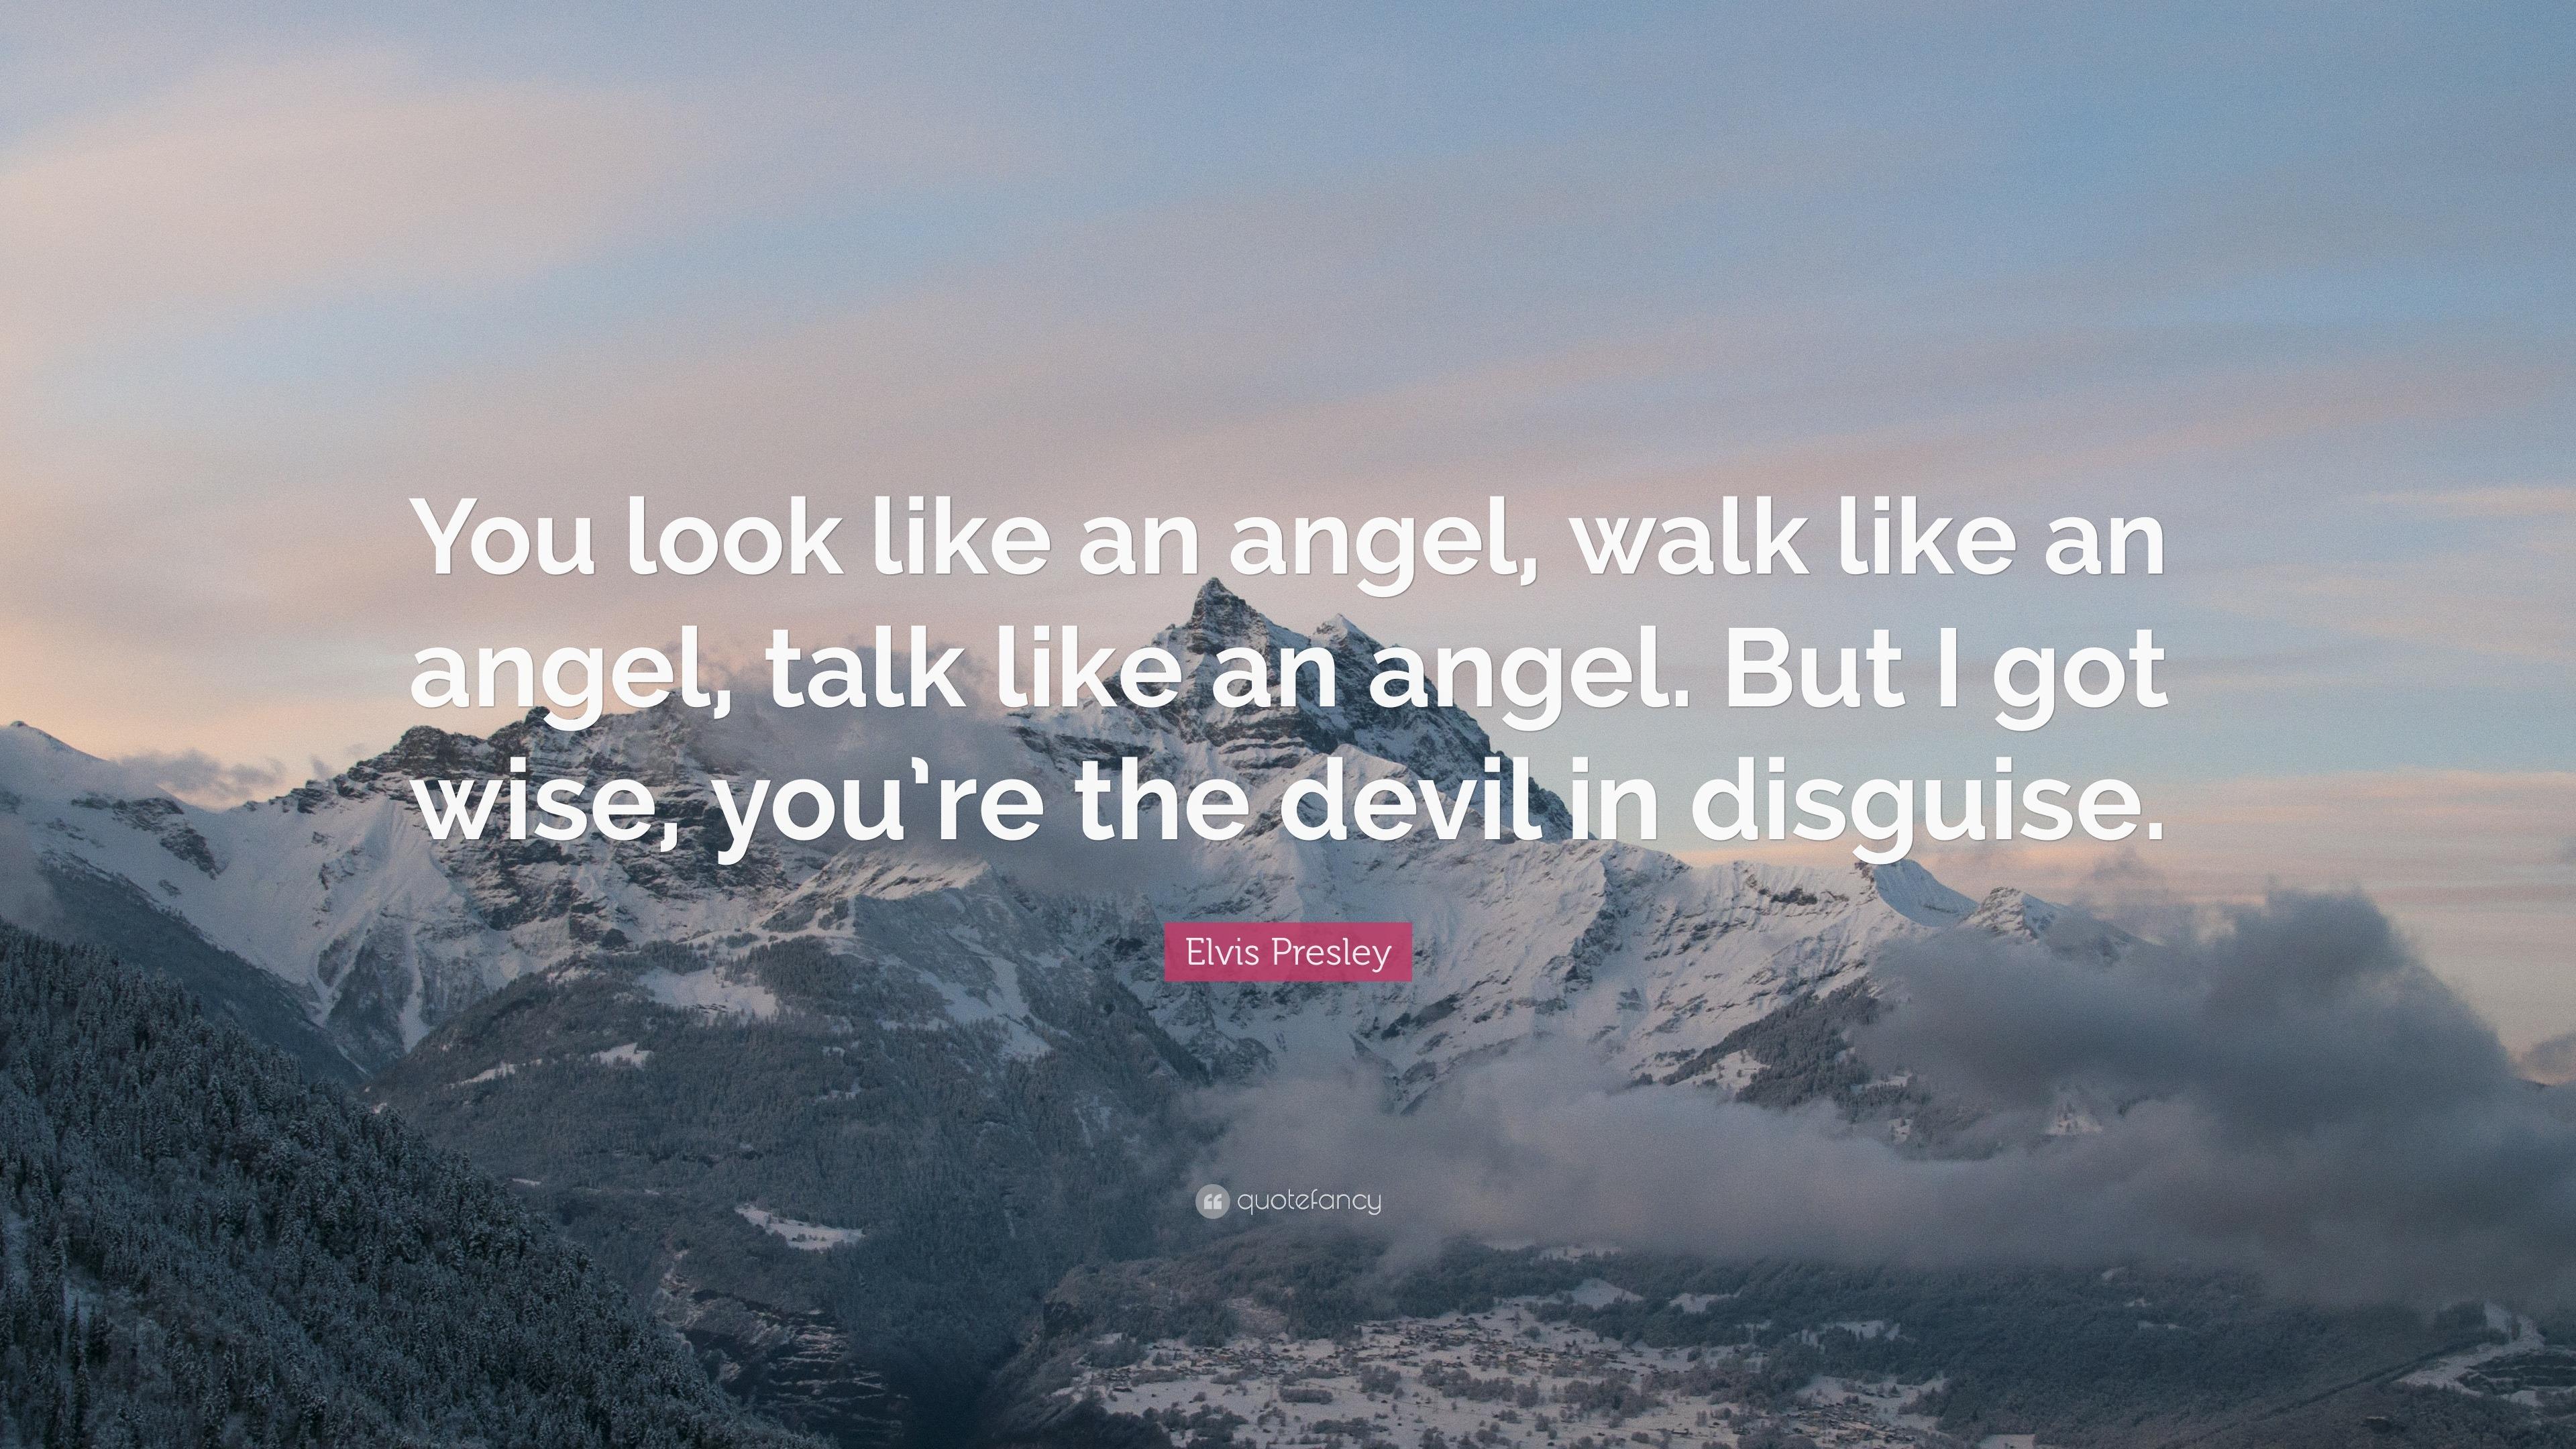 how to look like an angel